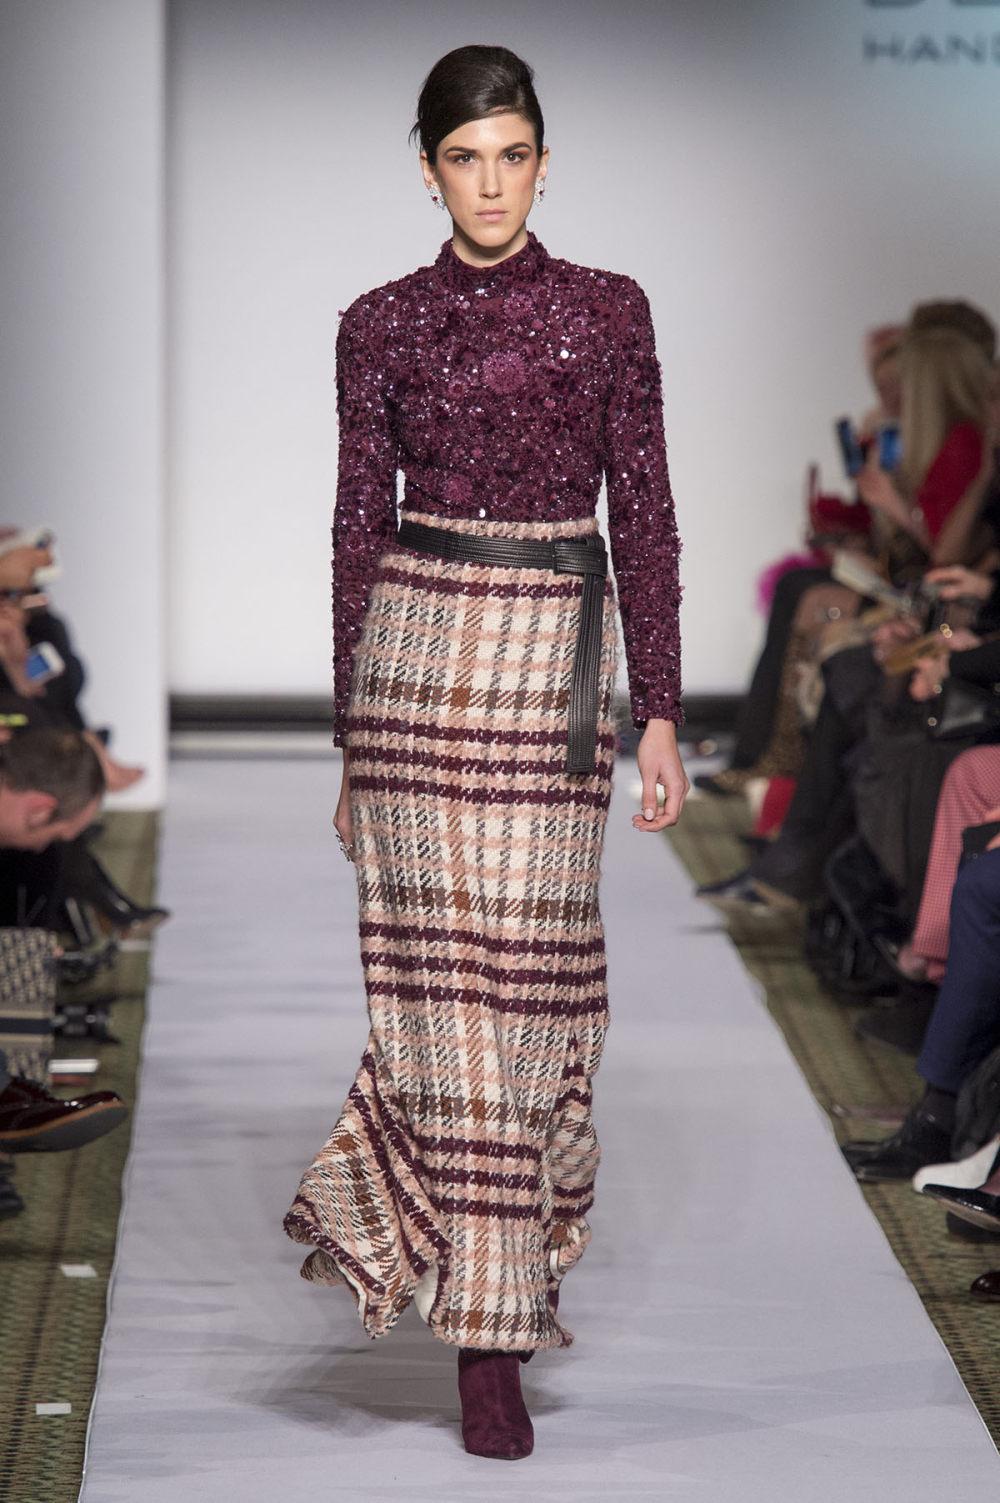 Carolina Herrera时装系列用鲜艳的颜色充满智能的黑白色调-20.jpg